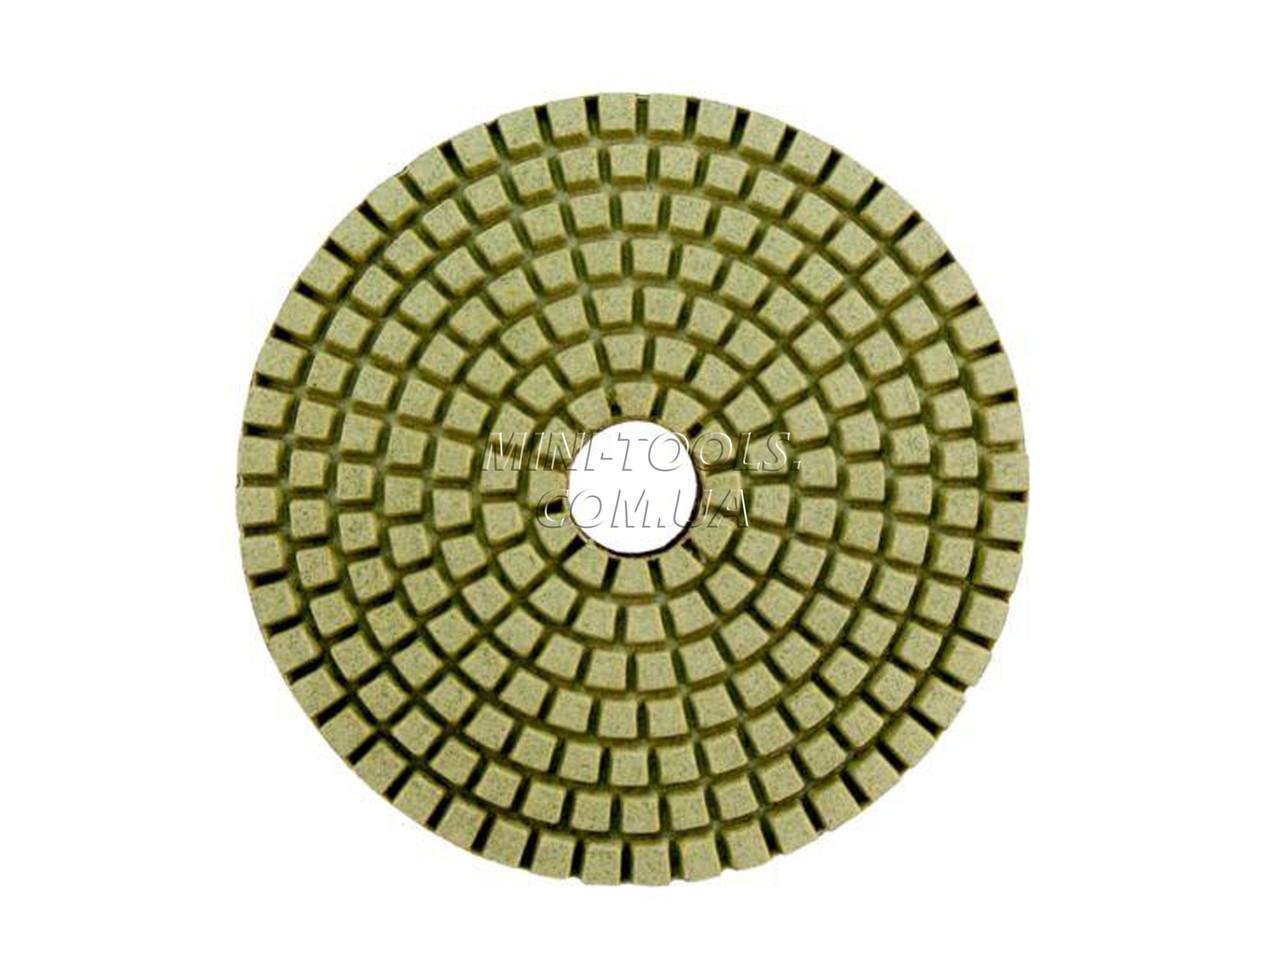 Черепашка D-100мм. зерно #600. Алмазний гнучкий шліфувальний круг YDS Tools